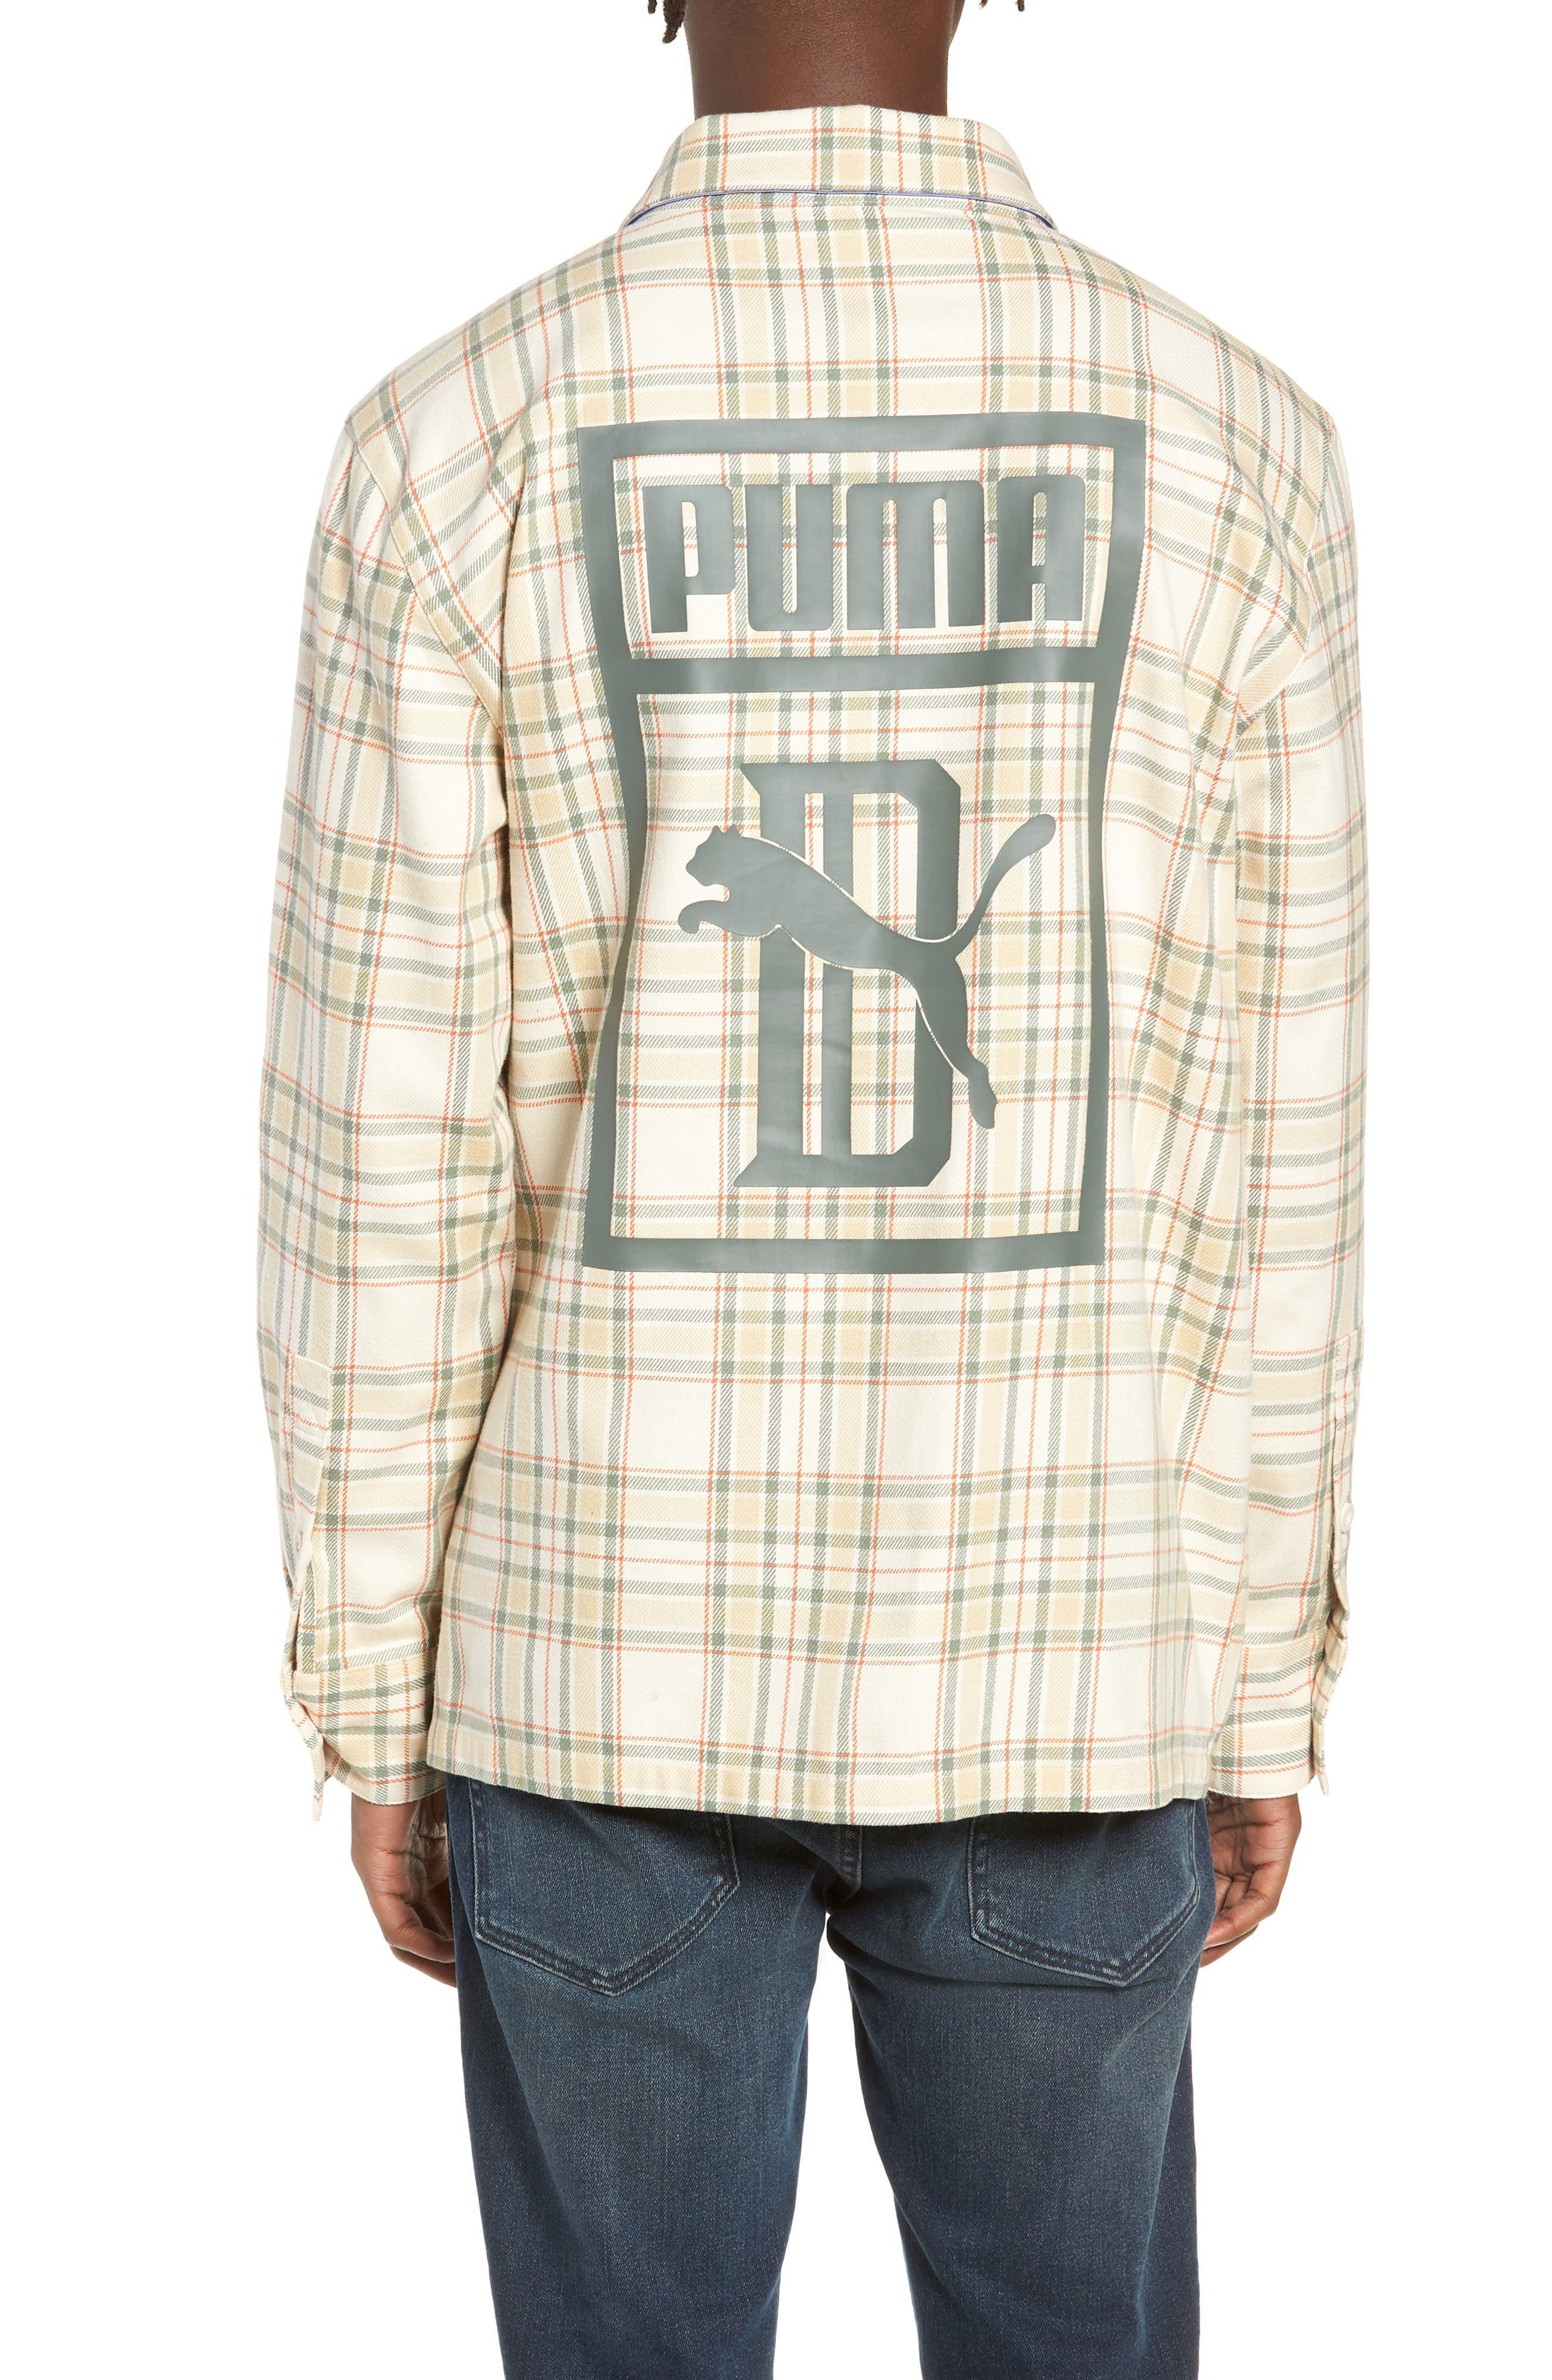 PUMA,                             x Big Sean Check Shirt,                             Alternate thumbnail 2, color,                             100